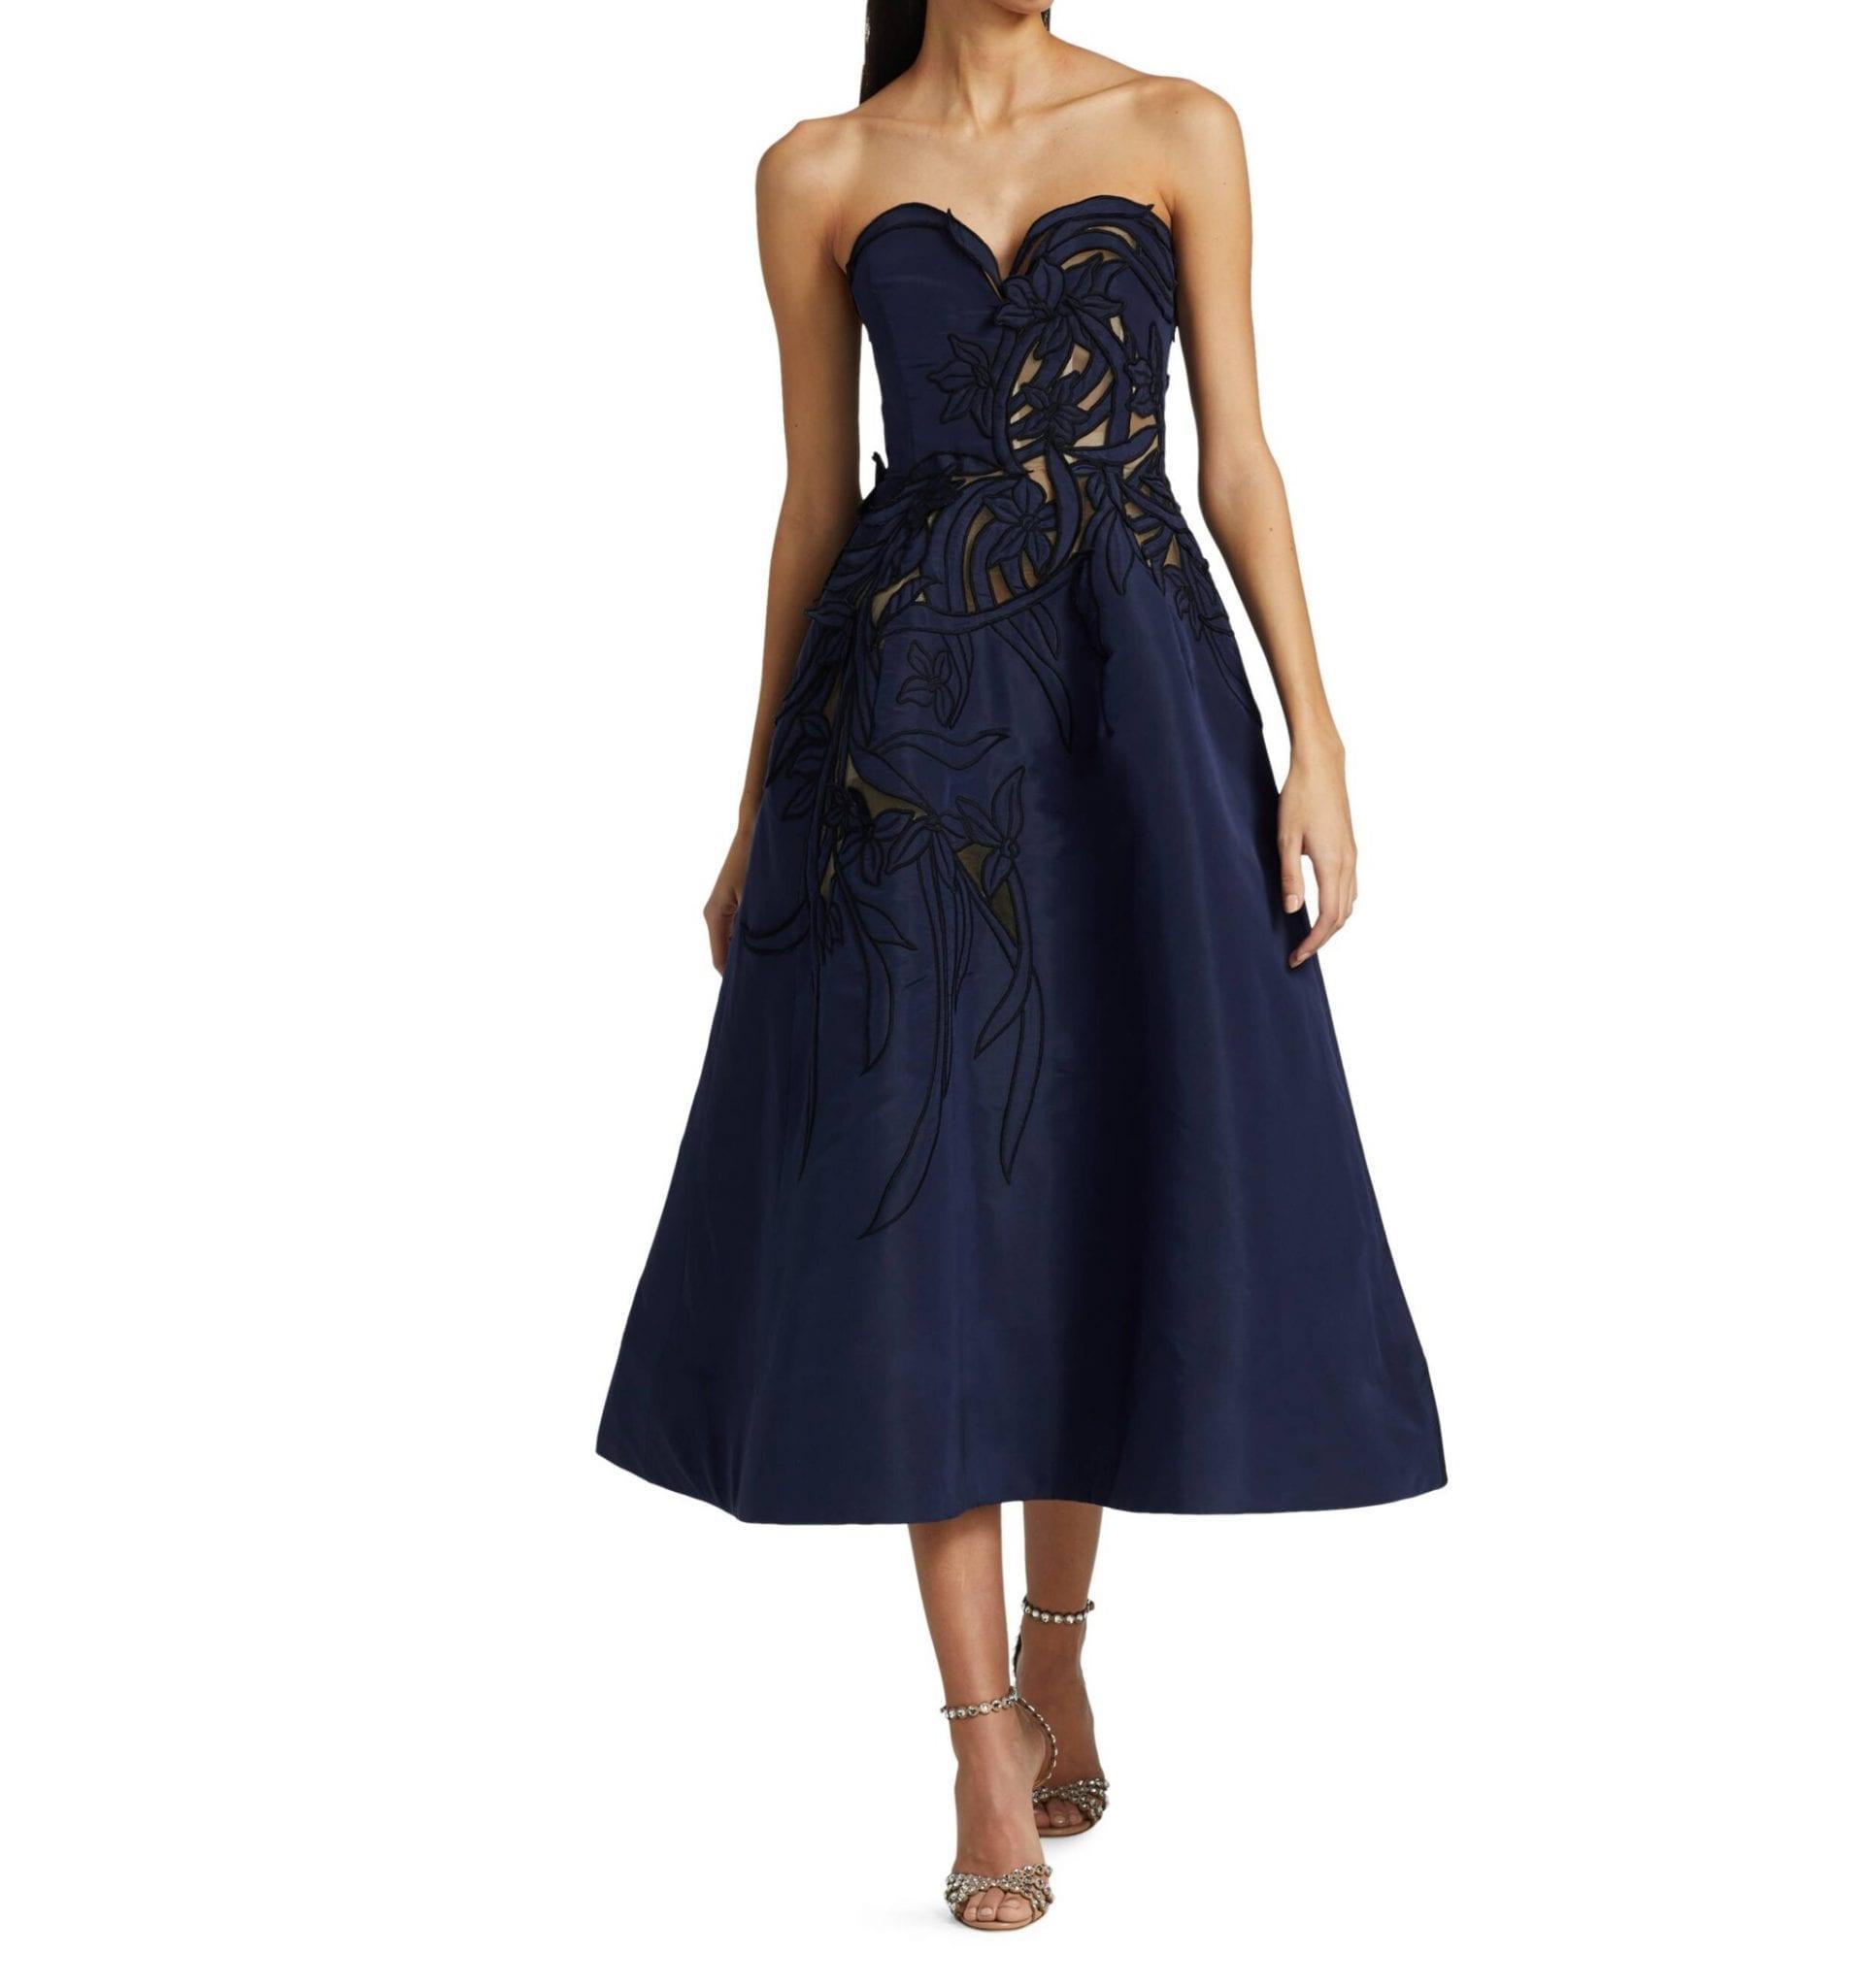 OSCAR DE LA RENTA Illusion Panel Sweetheart Neckline Full Skirt Cocktail Dress